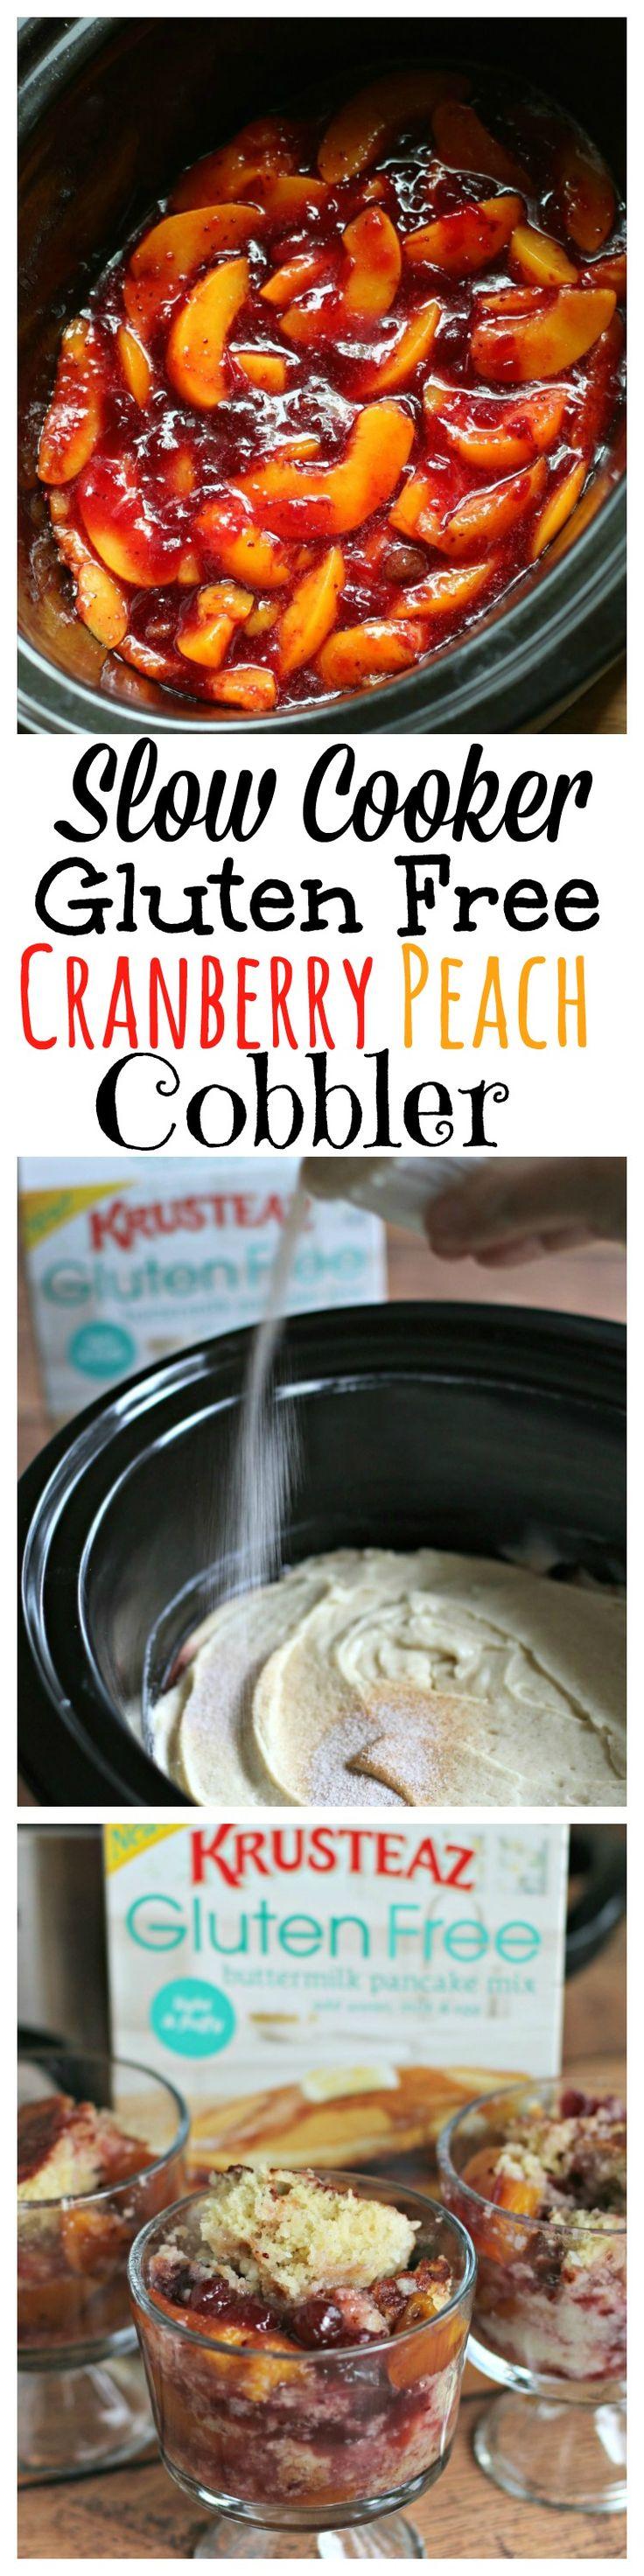 Slow Cooker Gluten Free Cranberry Peach Cobbler #sponsored